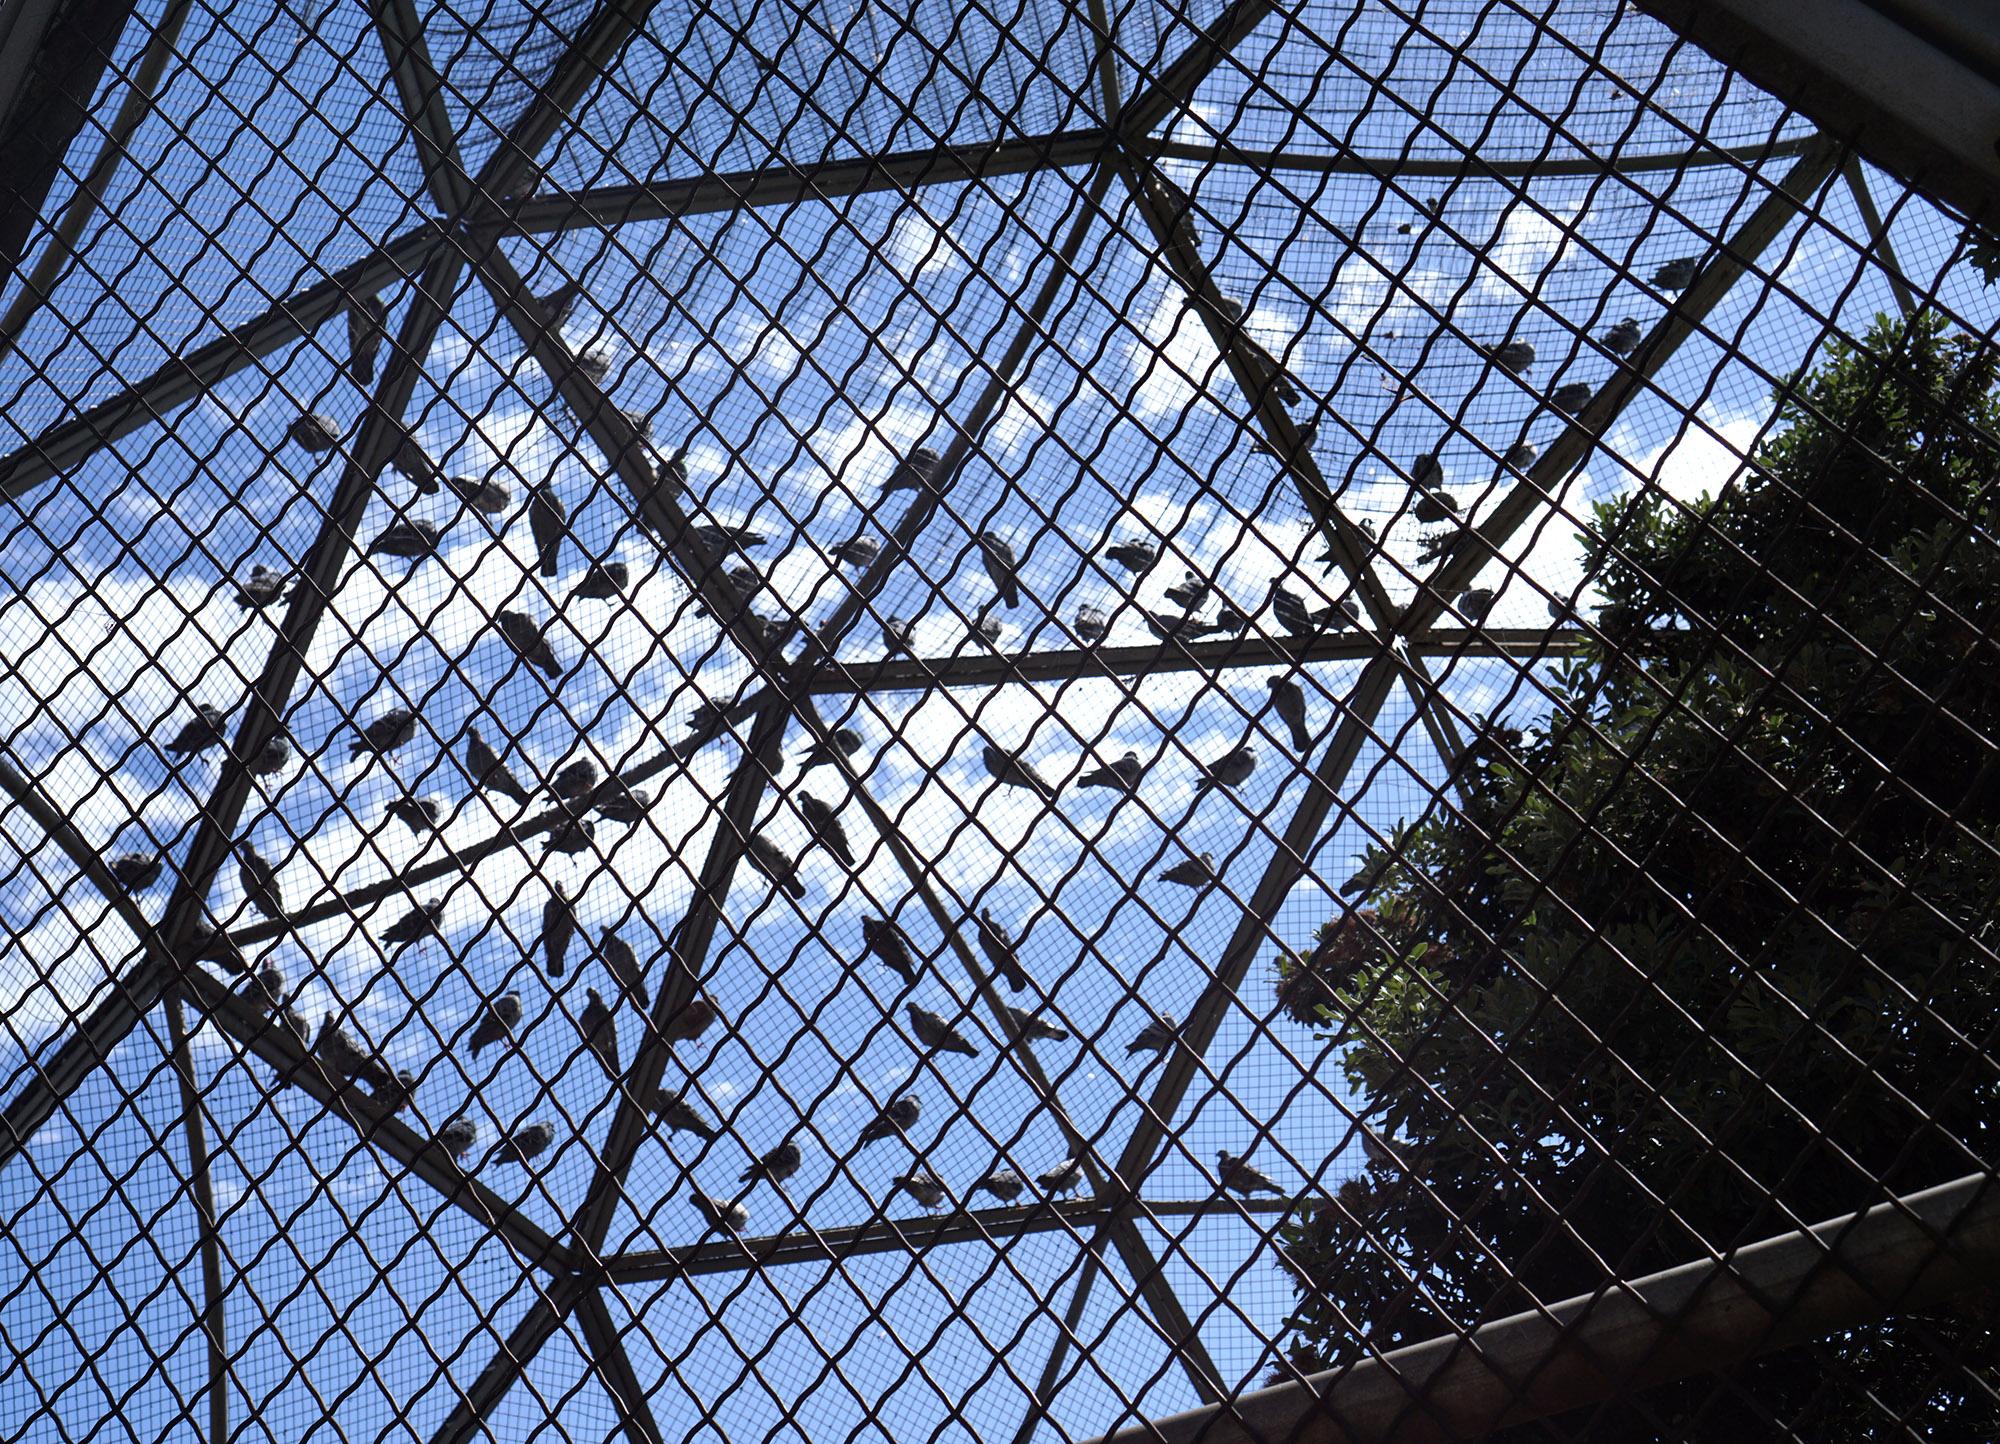 Birds perched at Lake Merritt, Oakland California / Darker than Green